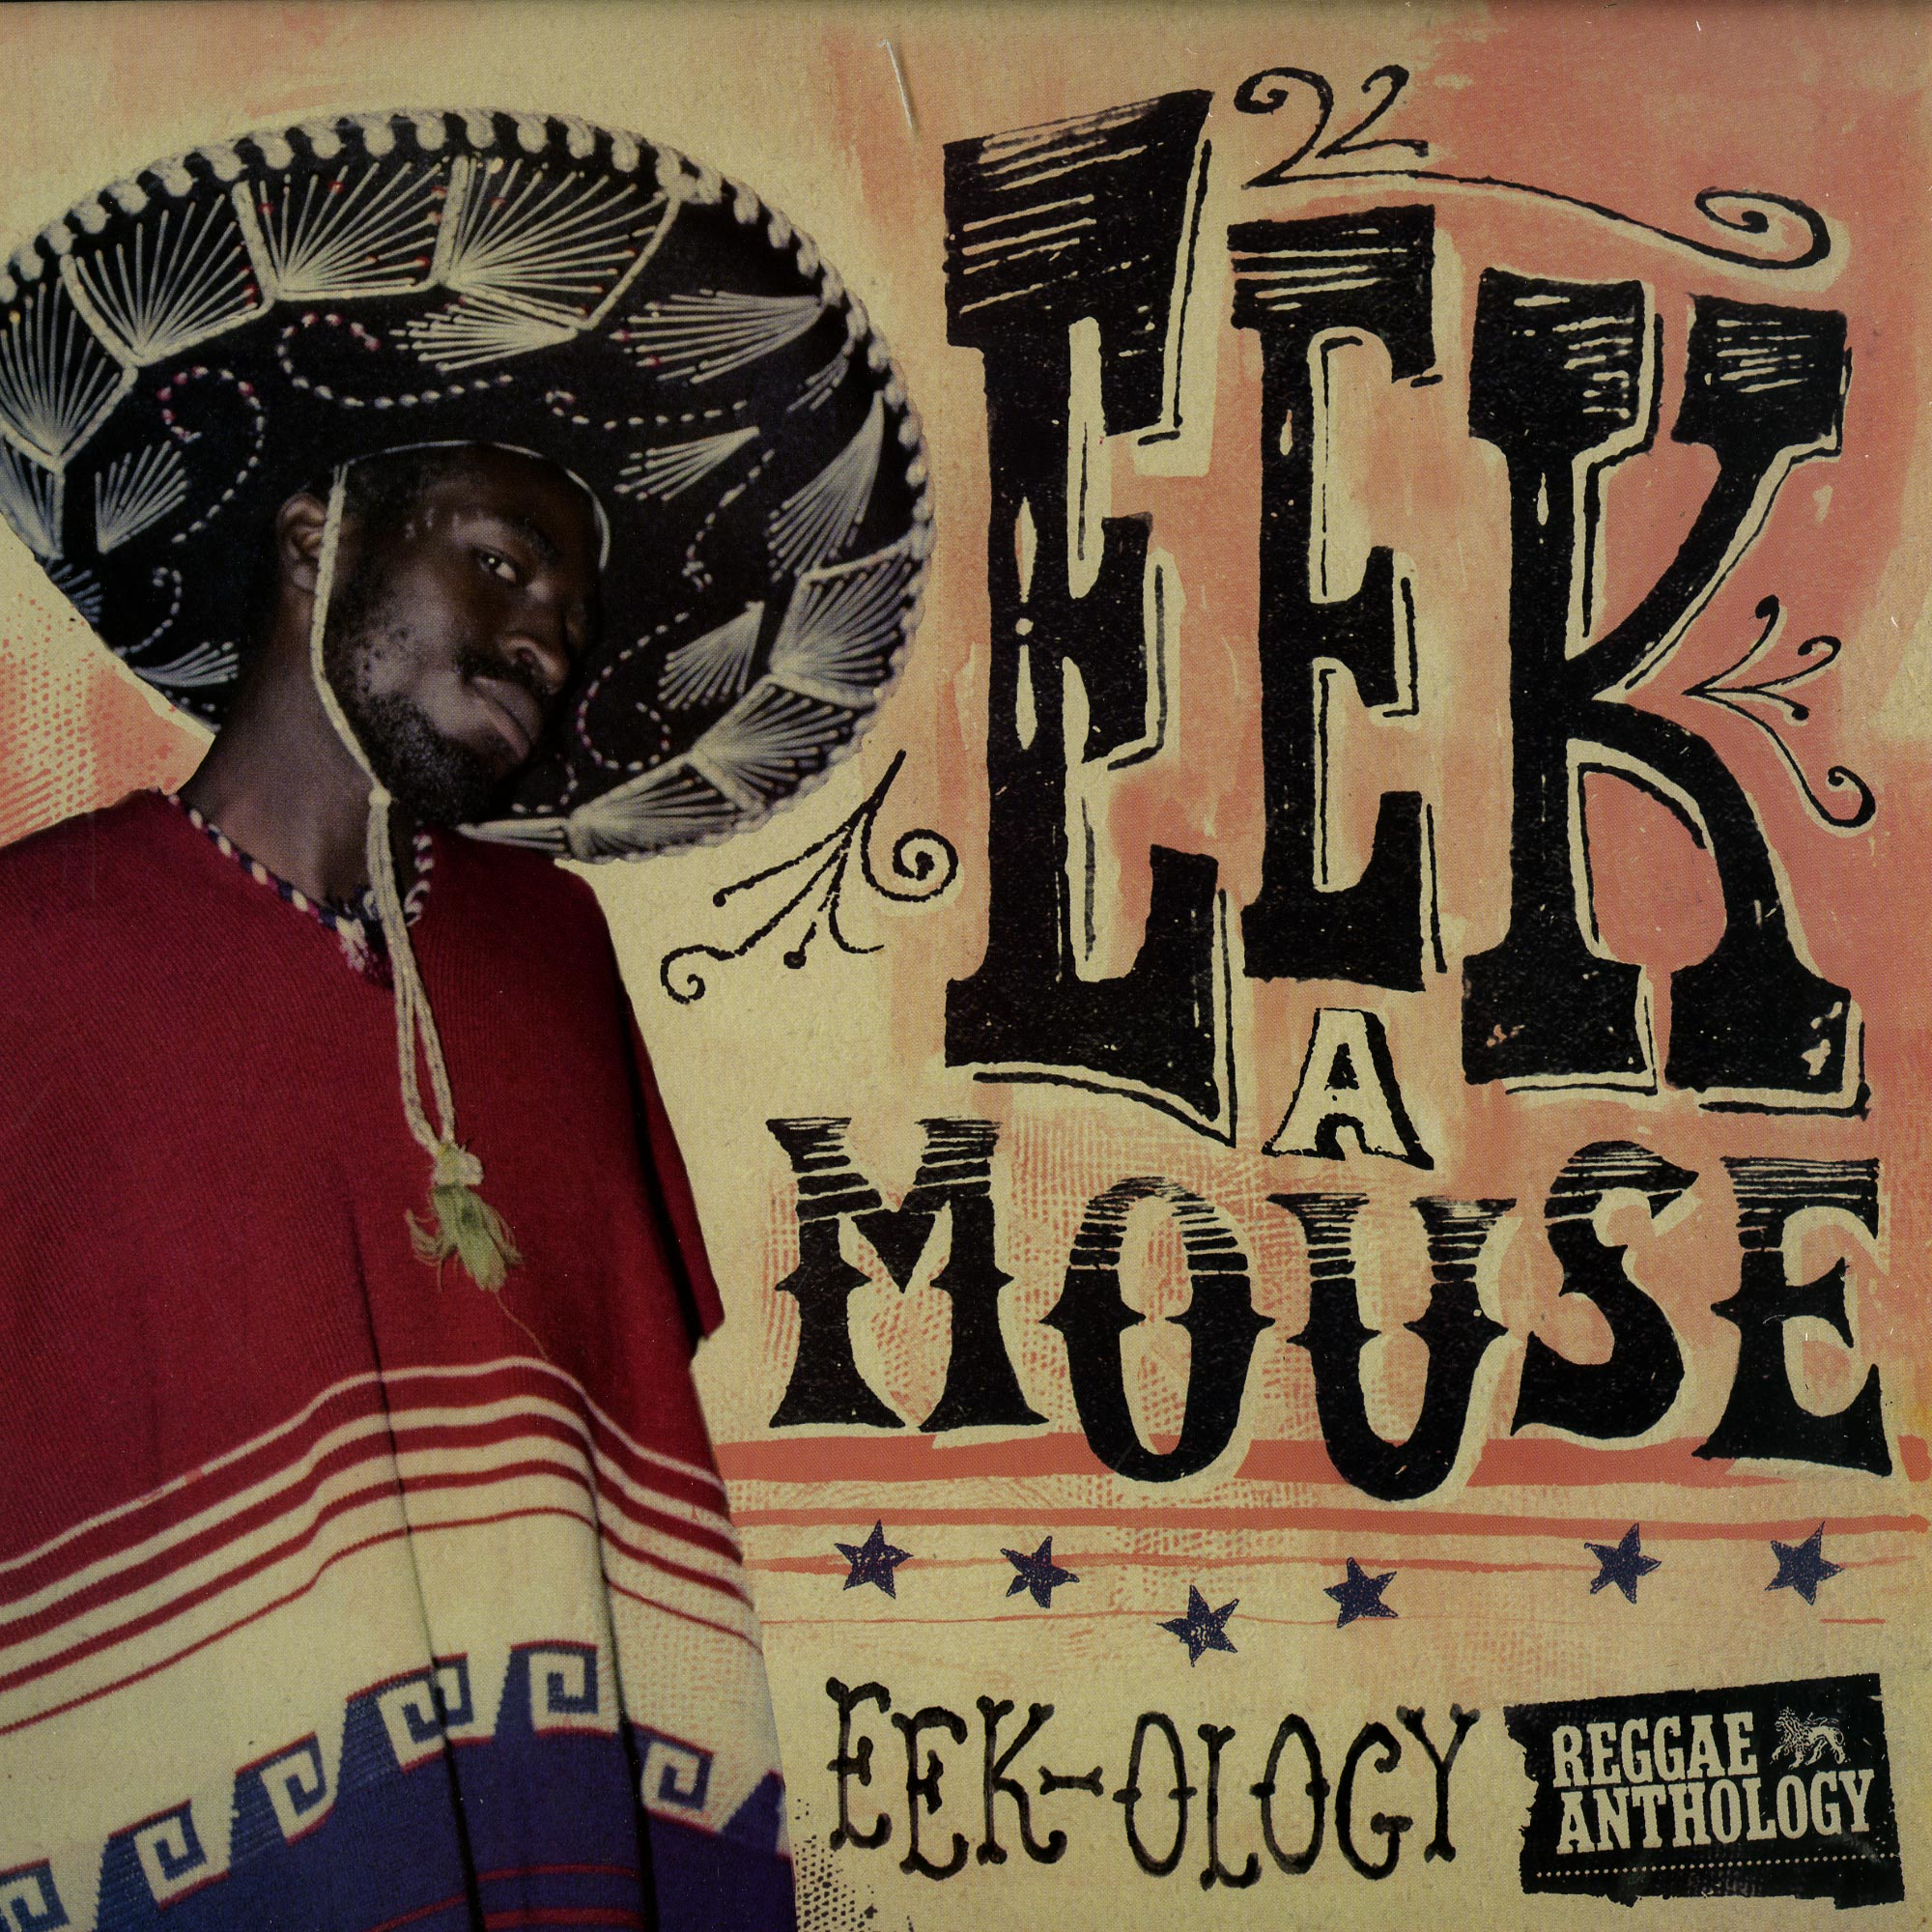 Eek-A-Mouse - EEK-OLOGY: REGGAE